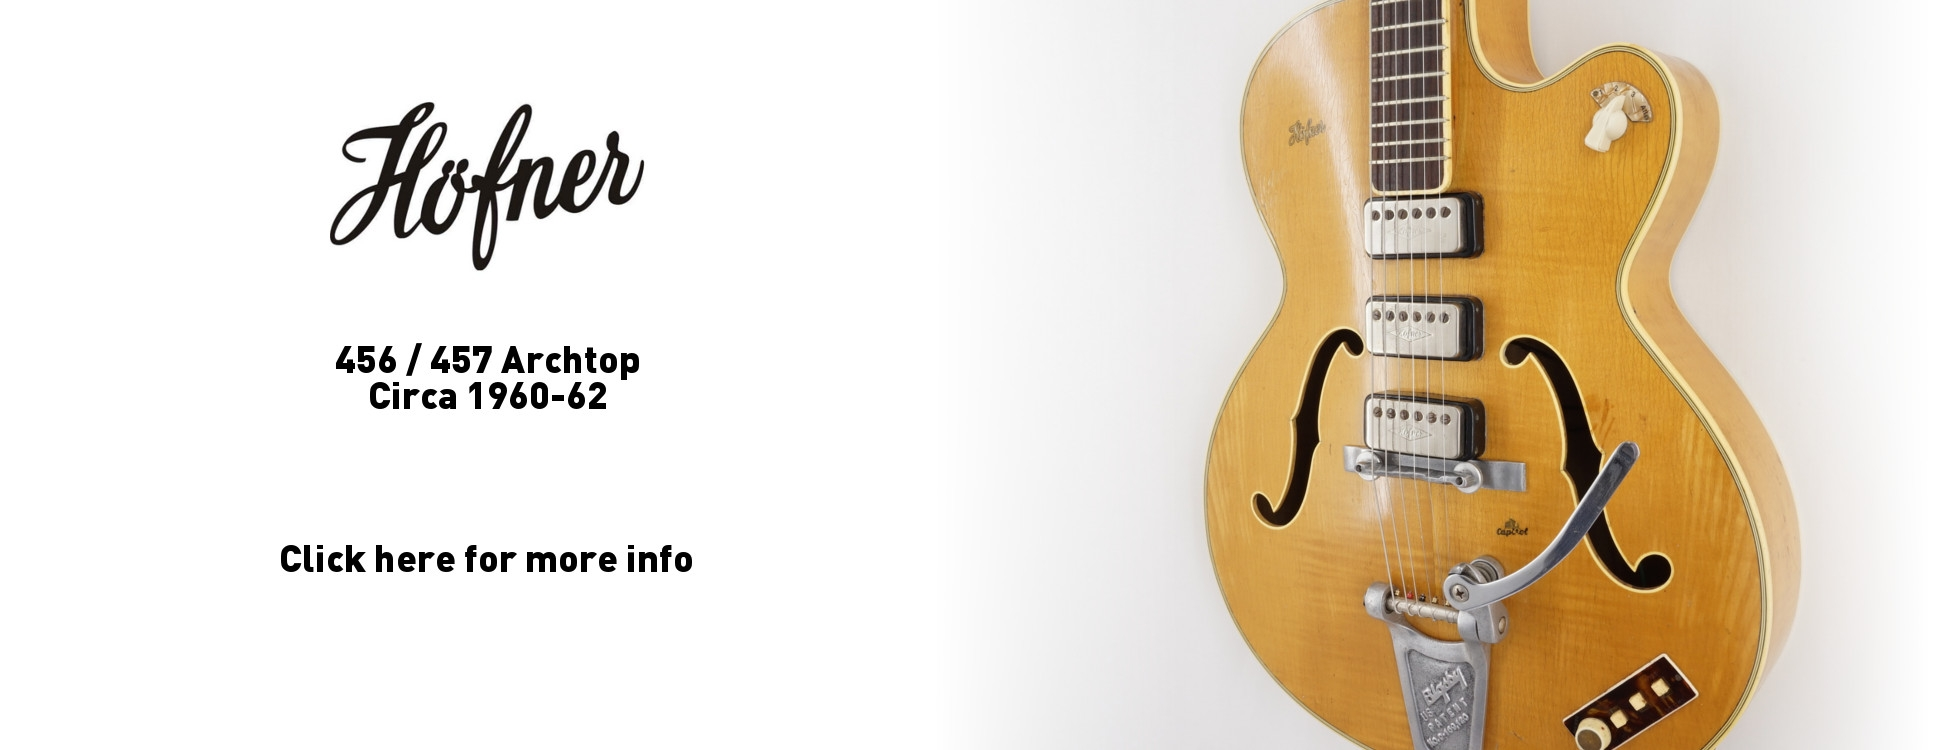 Hofner 456 457 Archtop Guitar